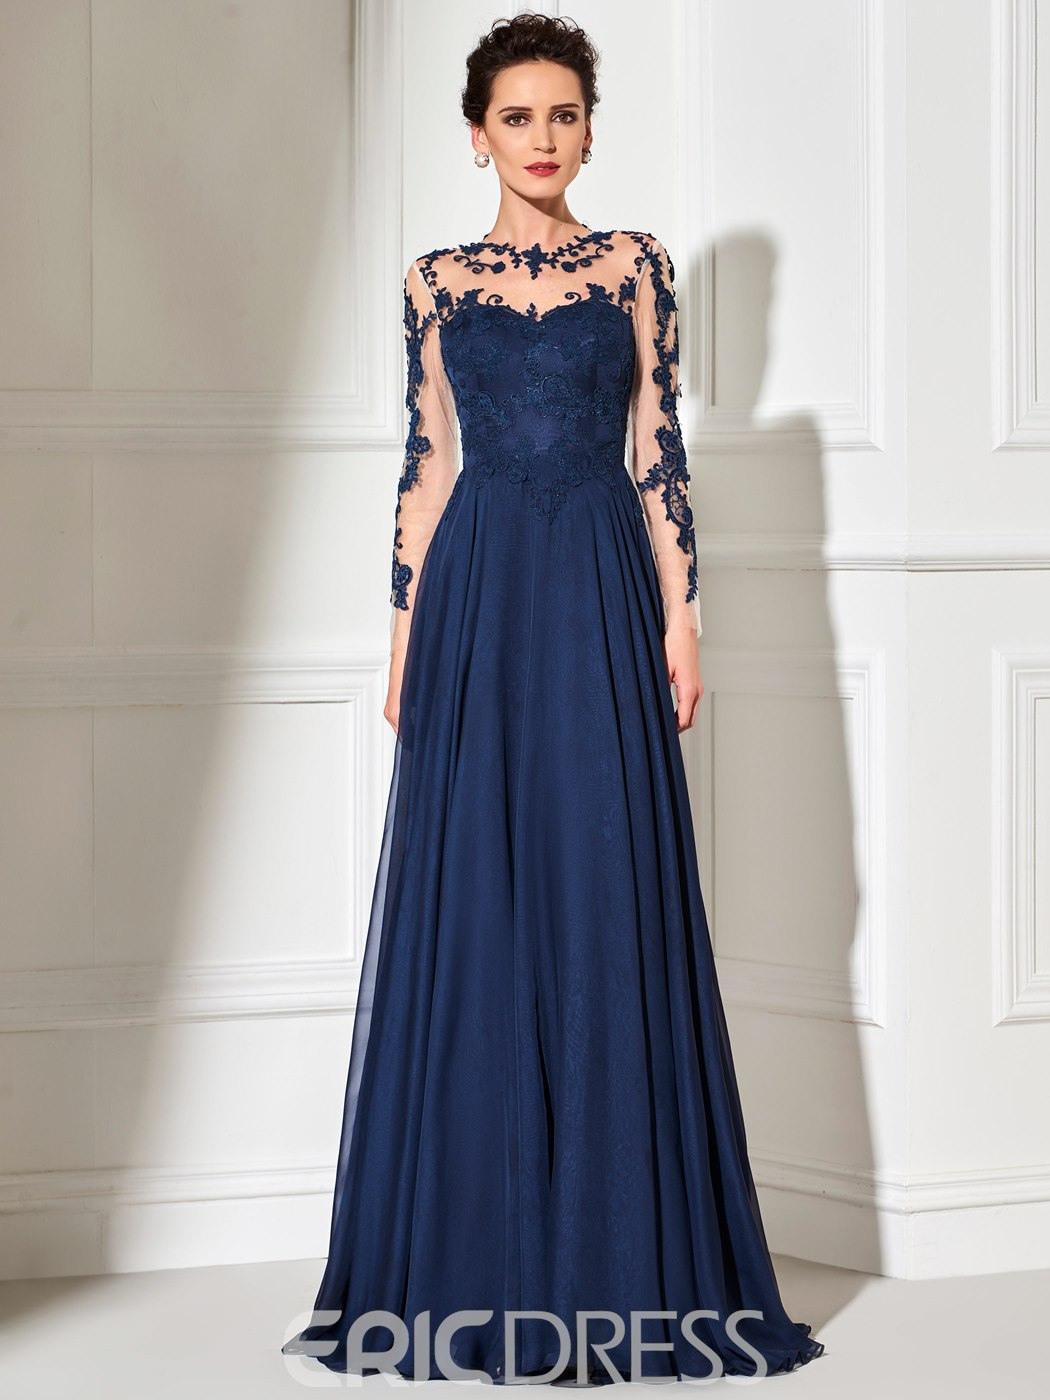 Abend Top Abendkleid Lange Ärmel Spezialgebiet Luxurius Abendkleid Lange Ärmel Vertrieb